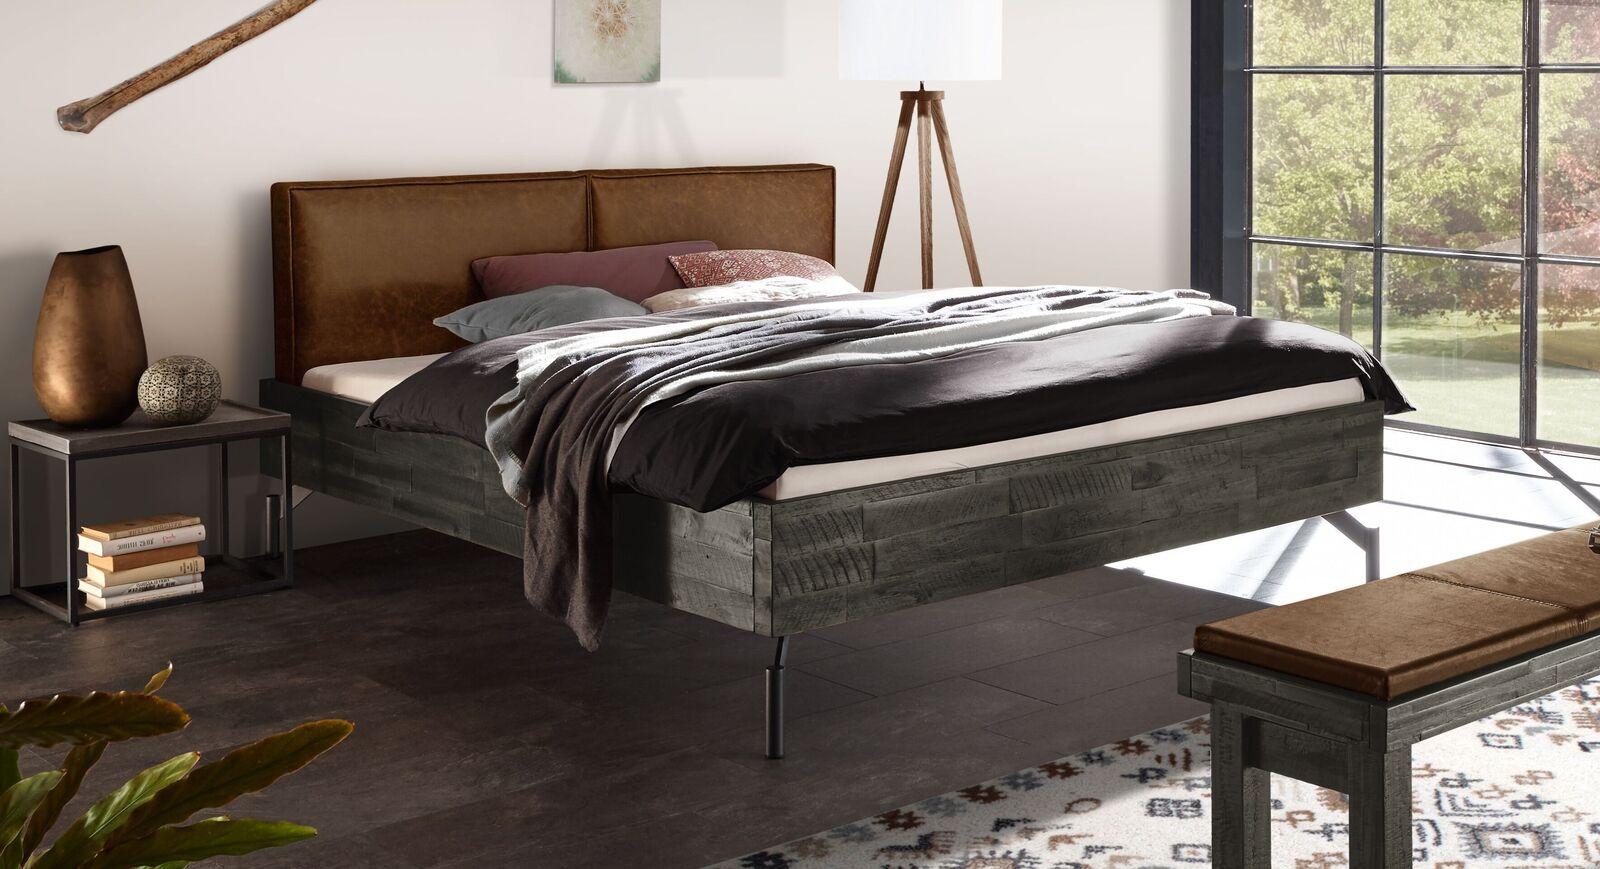 Graues Bett Envigado mit ockerfarbenem Kopfteil